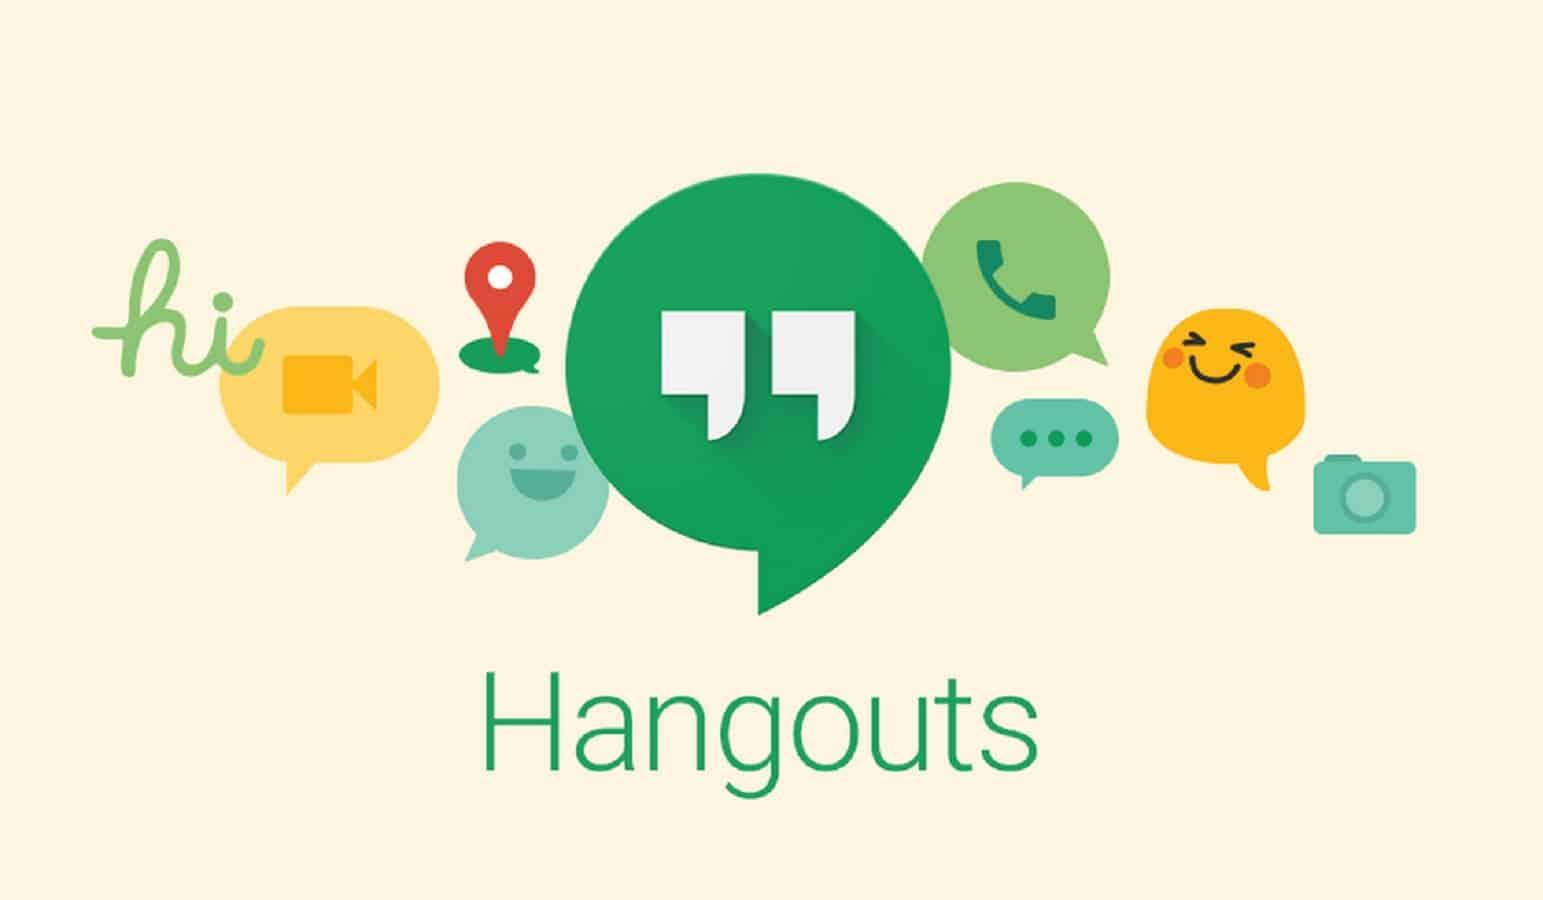 google hangouts logo